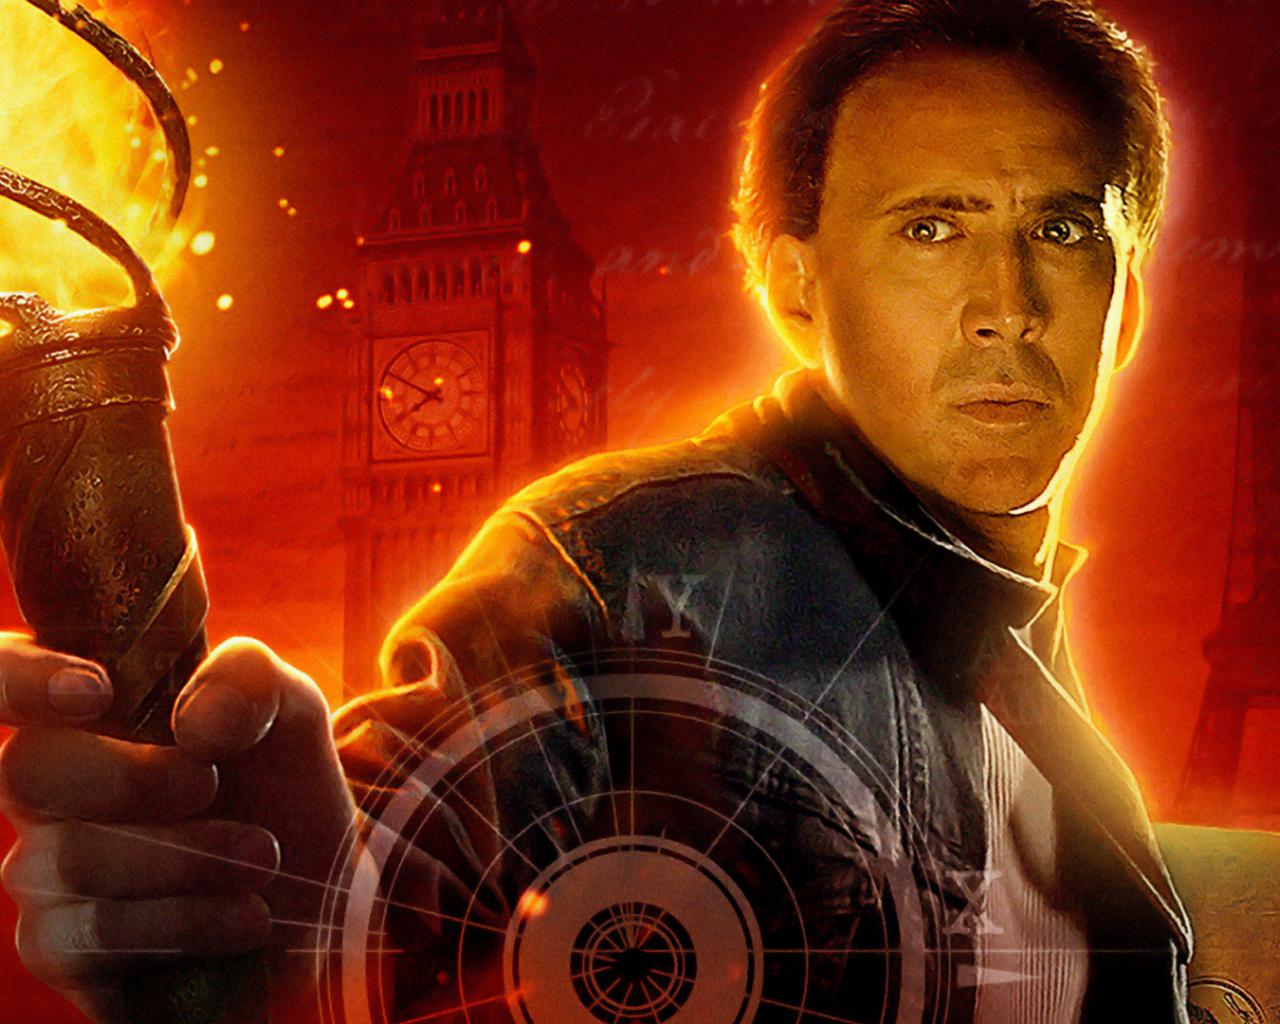 Desktop Wallpaper National Treasure Book Of Secrets 2007 Movie Nicolas Cage Hd Image Picture Background 63 Nfd